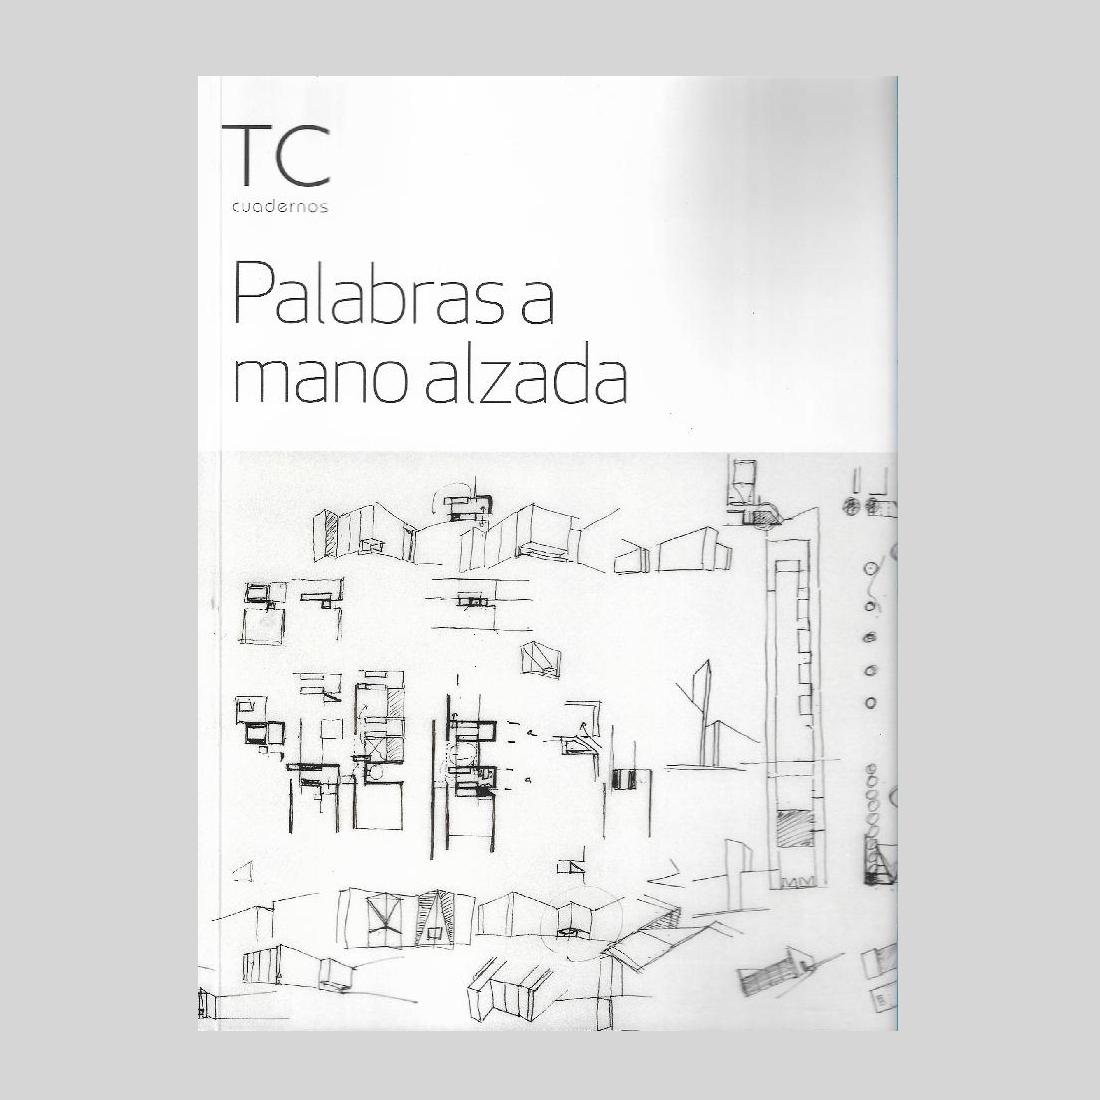 TC Cuadernos – Palabras a mano alzada | Brenac & Gonzalez et Associés